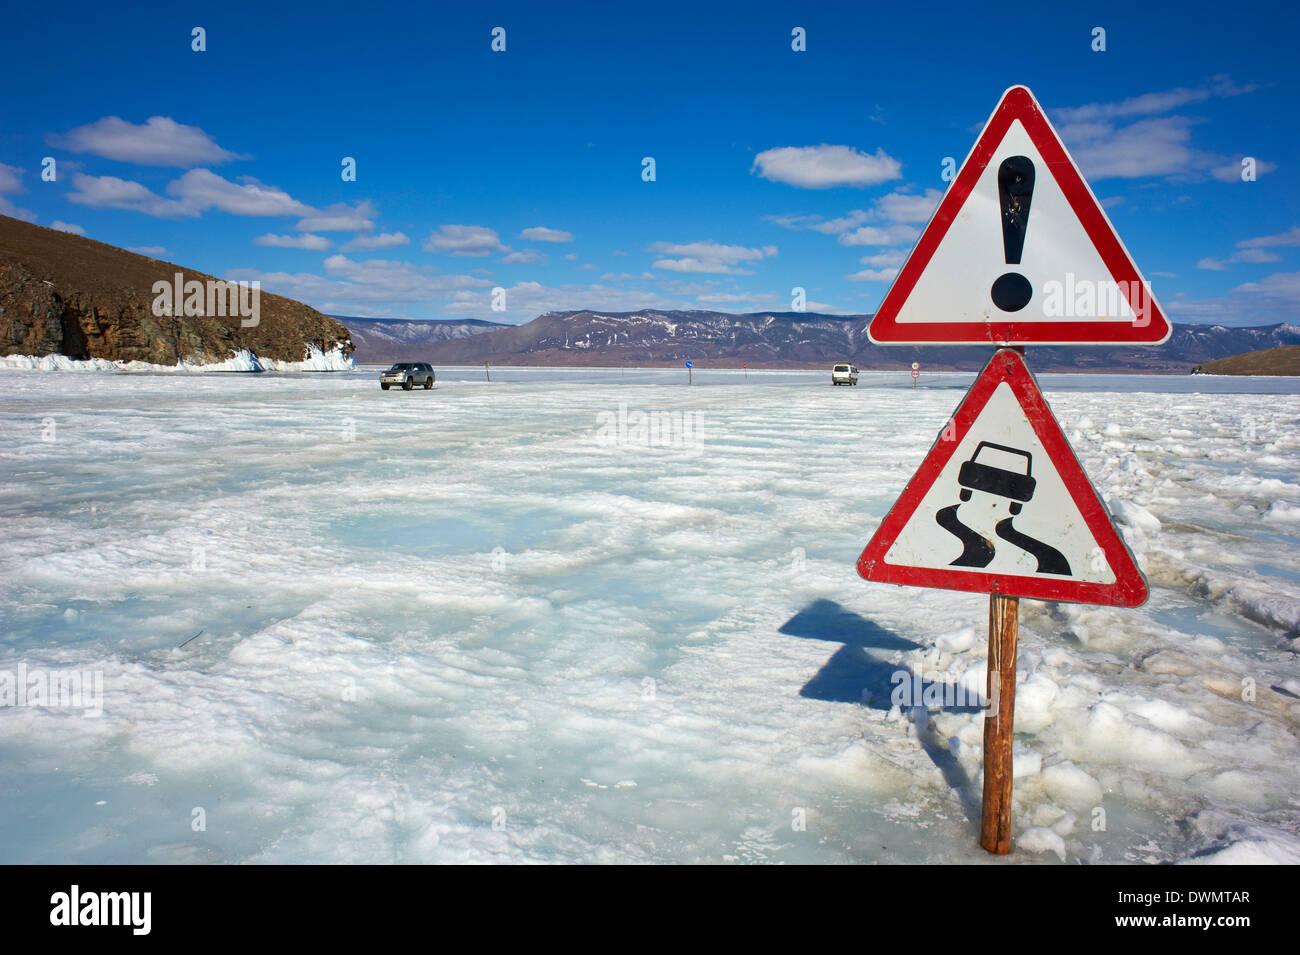 Maloe More (Little Sea), frozen lake during winter, Olkhon island, Lake Baikal, UNESCO Site, Irkutsk Oblast, Siberia, Russia - Stock Image